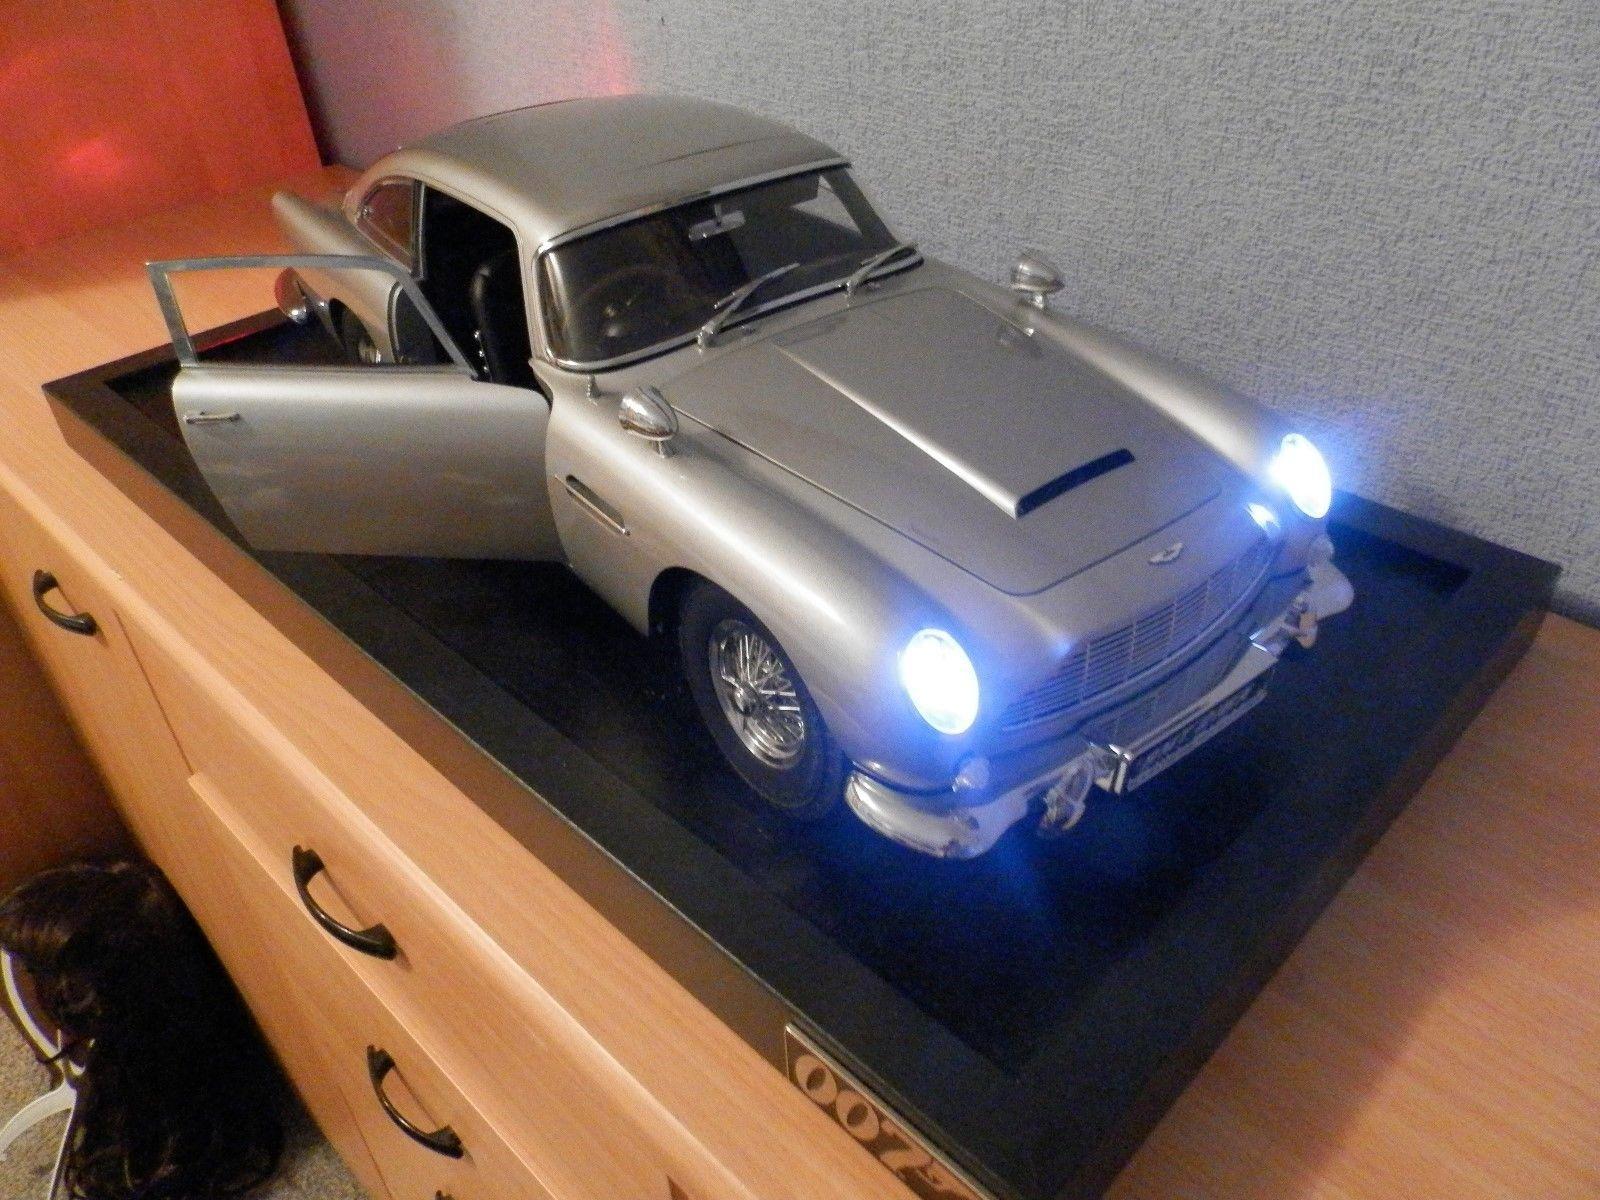 James Bond 007 Db5 Aston Martin Scale 1 8 Classic Model Car 86 Parts Eaglemoss Ebay Corgi Toys Ride On Toys Harley Softail Slim